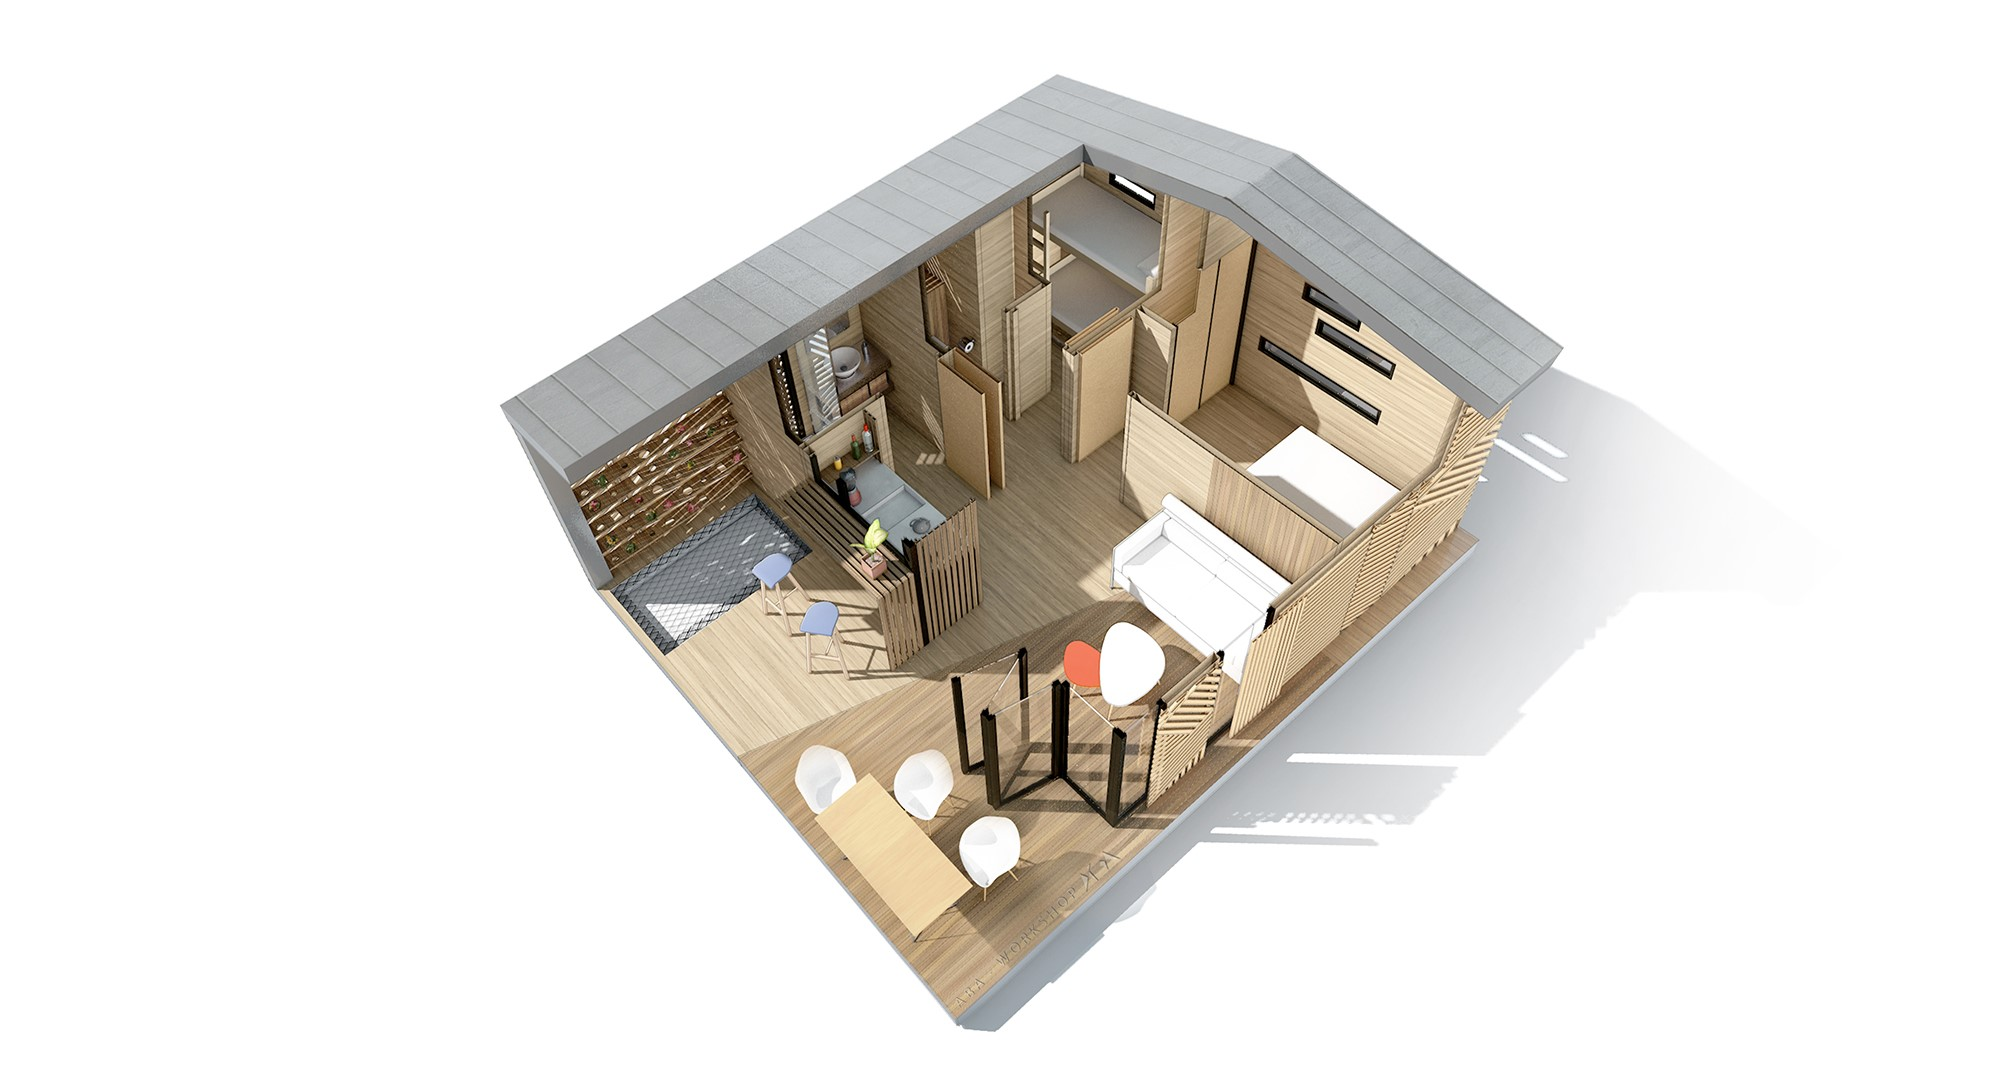 mon chalet d architecte c25 aba workshop. Black Bedroom Furniture Sets. Home Design Ideas